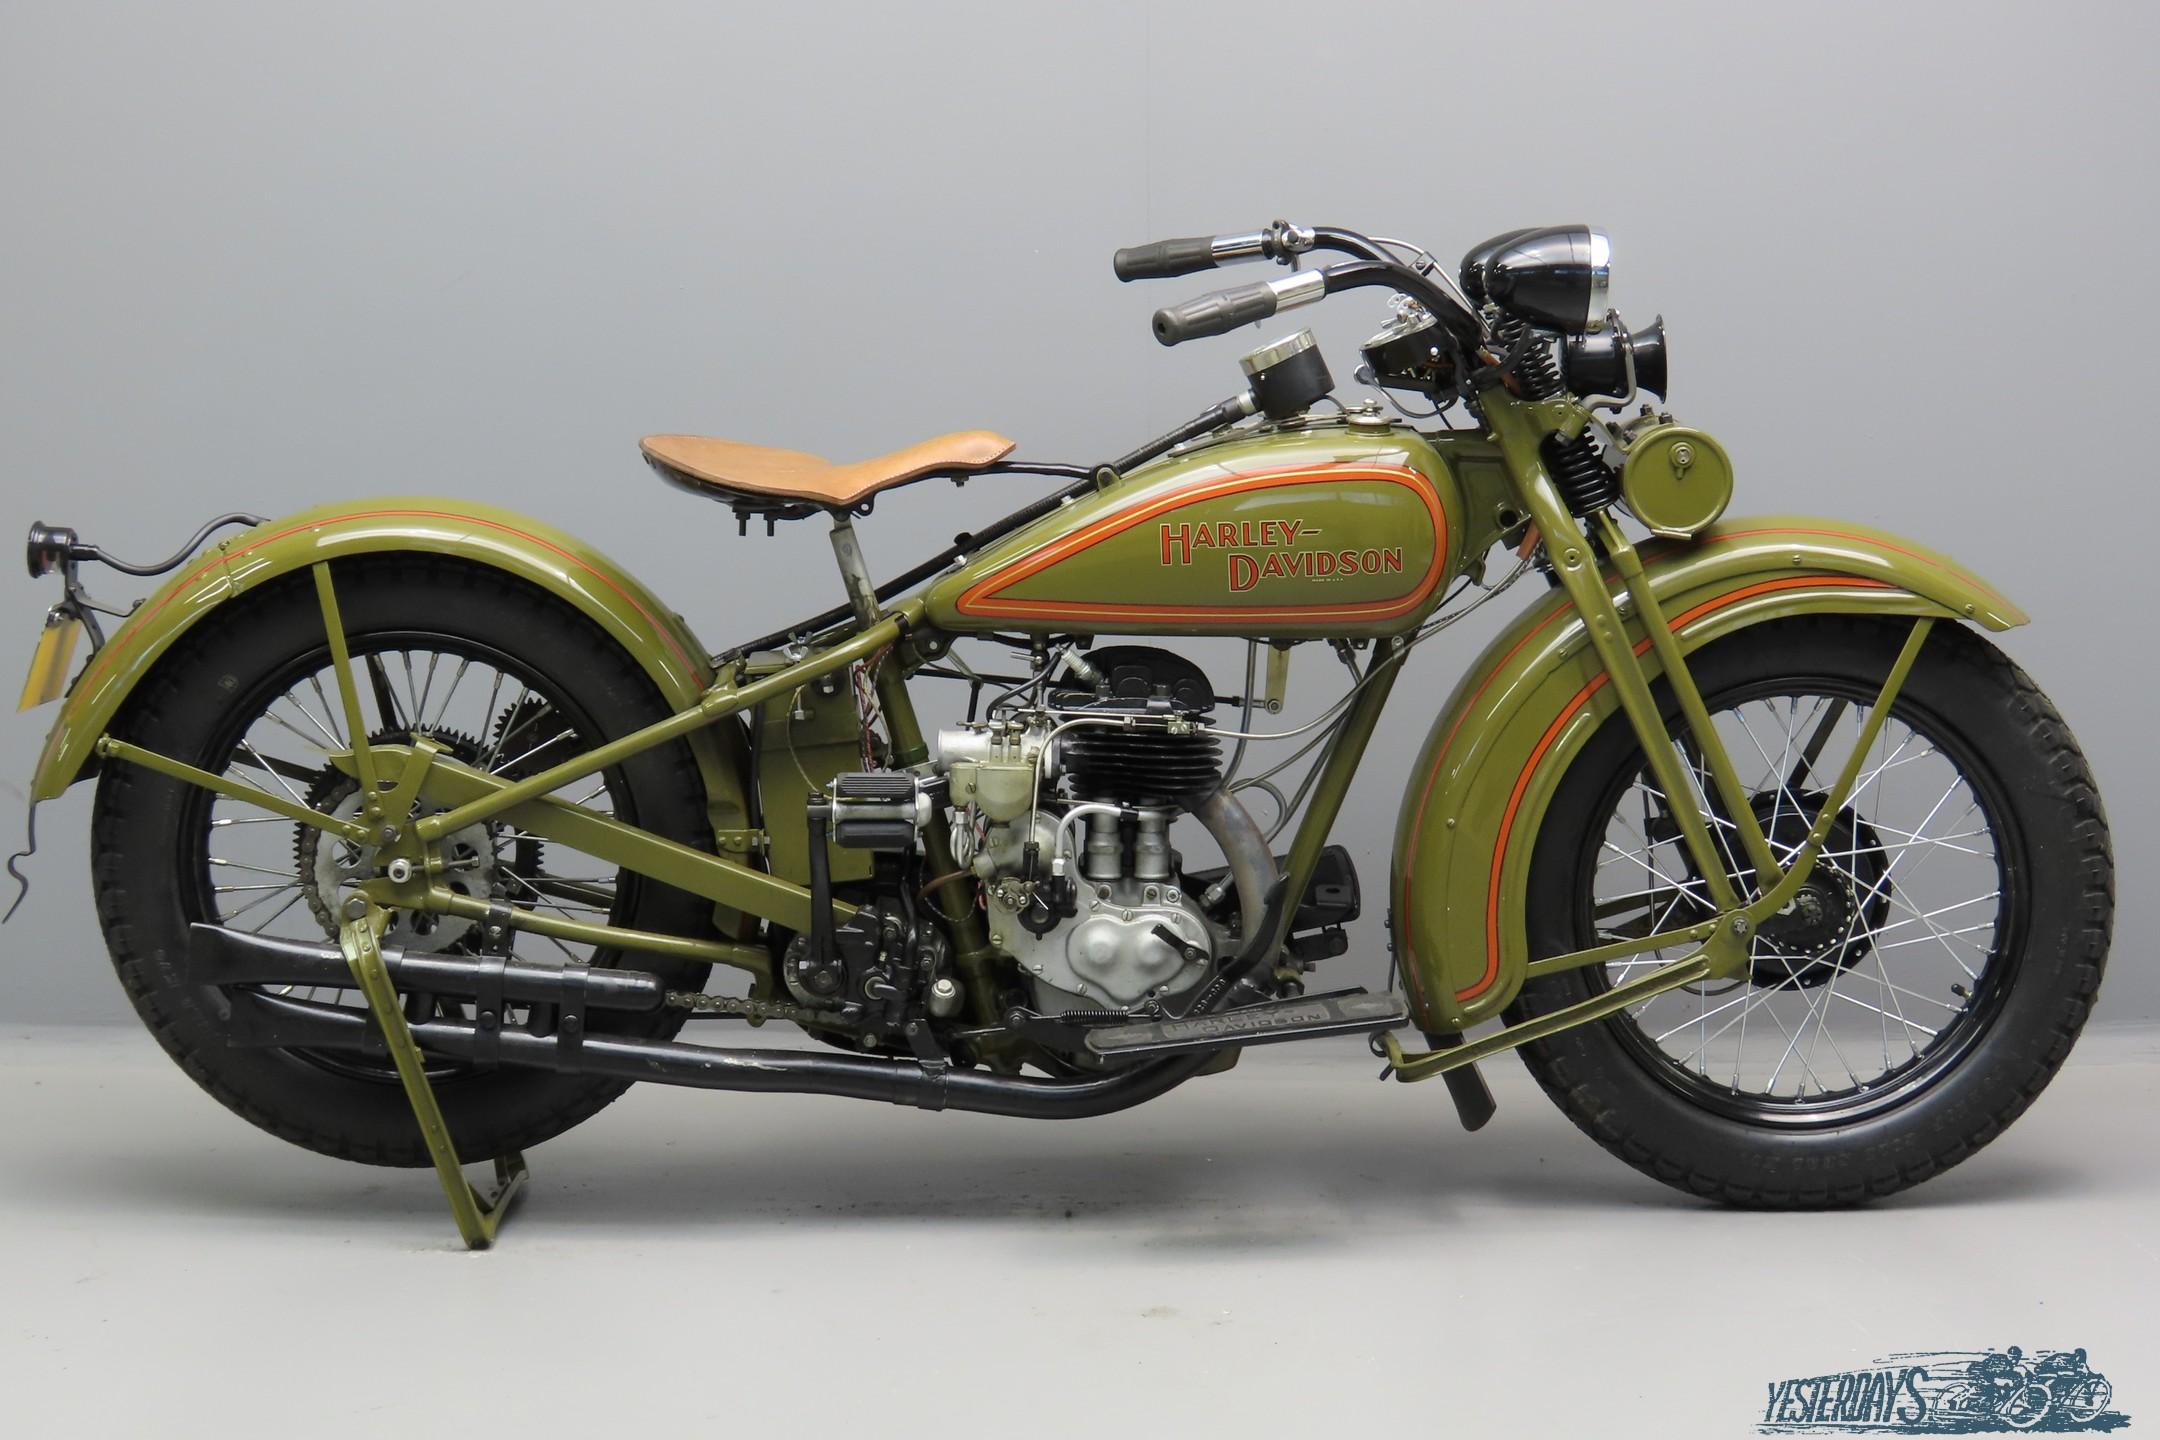 Harley Davidson 1930 Model 30C 493cc 1 cyl sv  3007